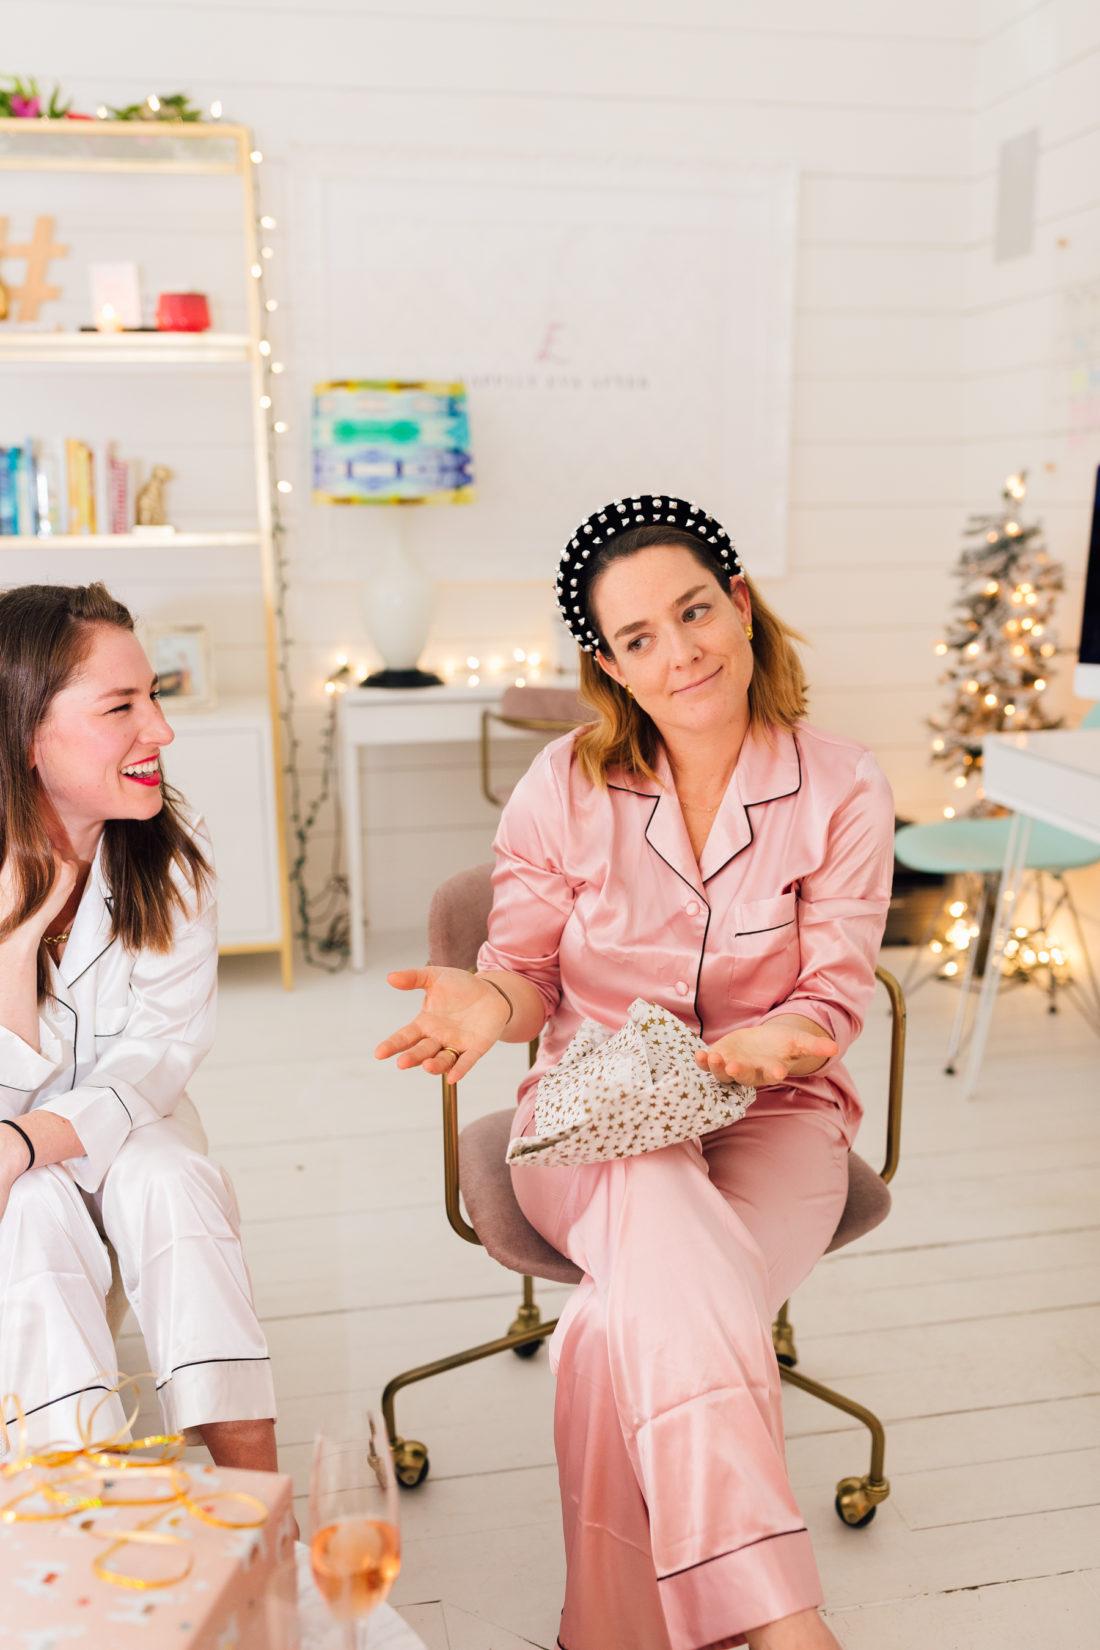 Eva Amurri poses with her girlfriends in their matching silk pajamas